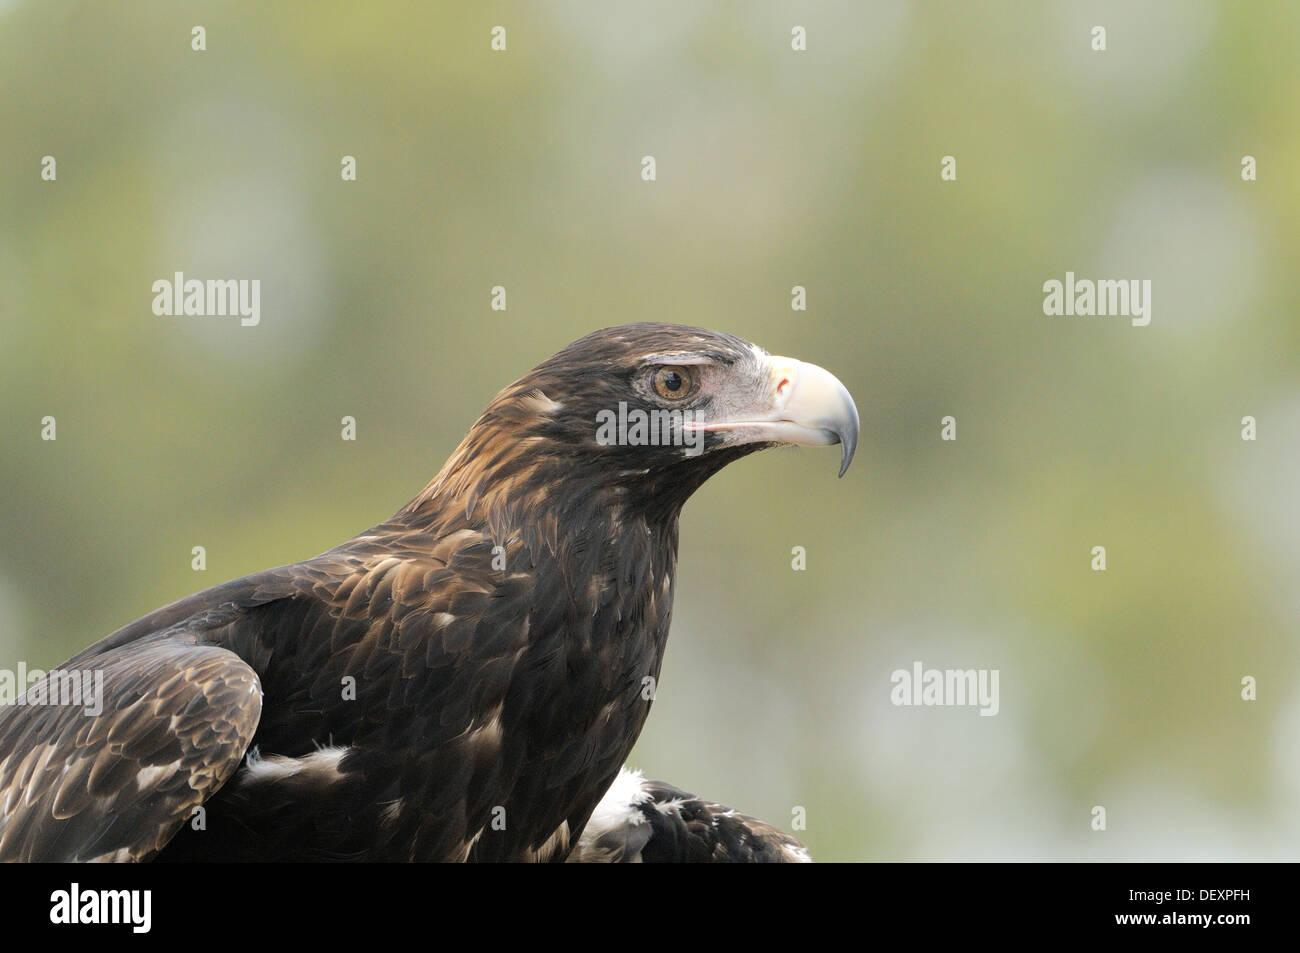 Wedge-tailed Eagle Aquila audax Adult Head close up Photographed in Tasmania, Australia - Stock Image